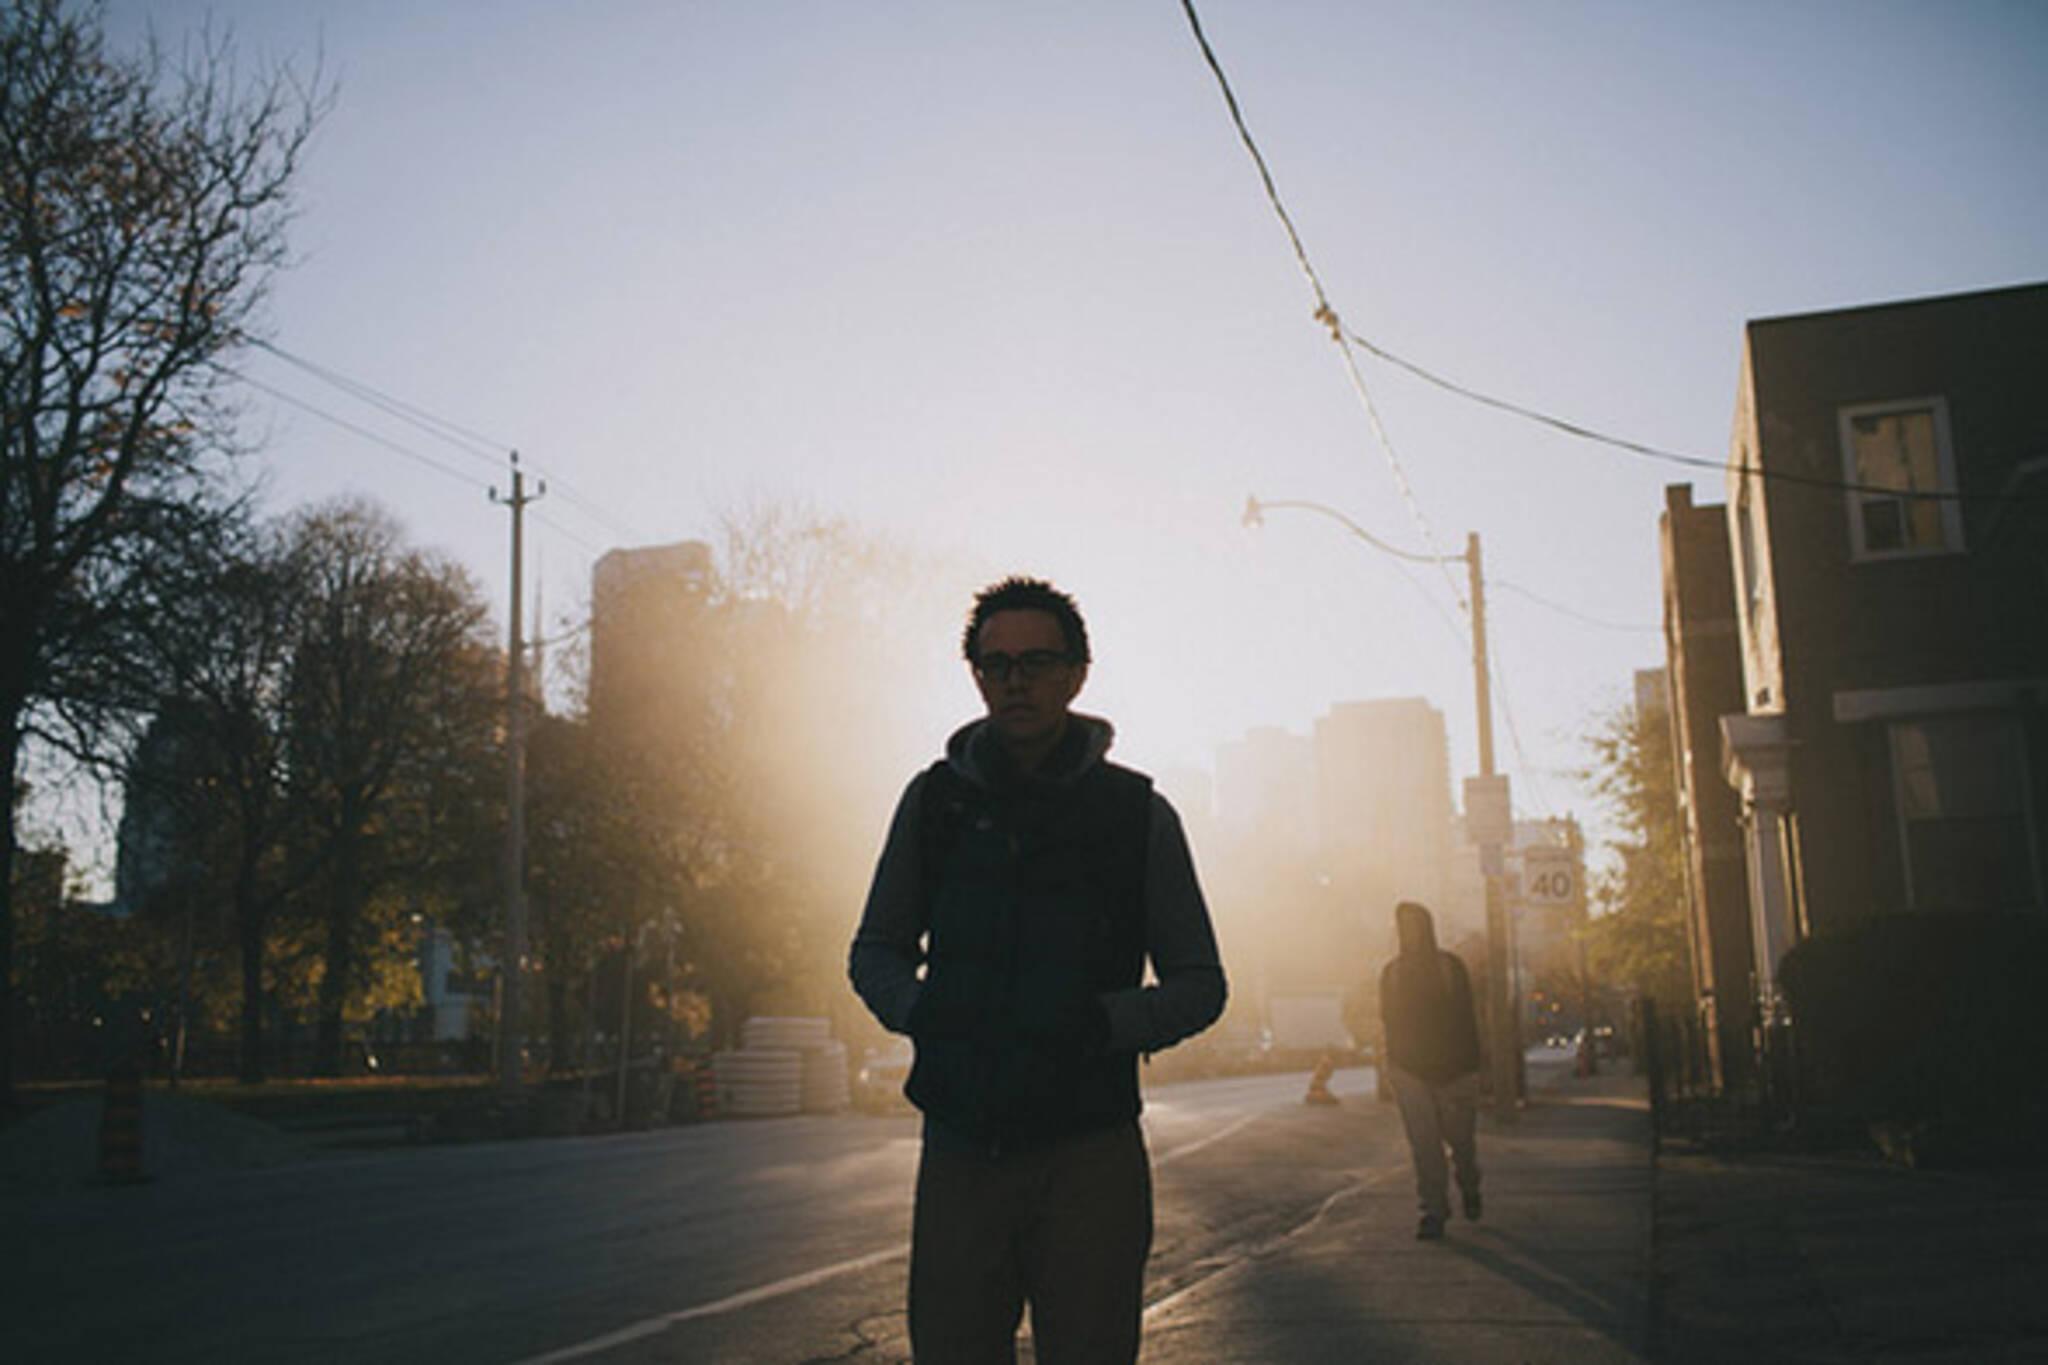 Toronto street photography